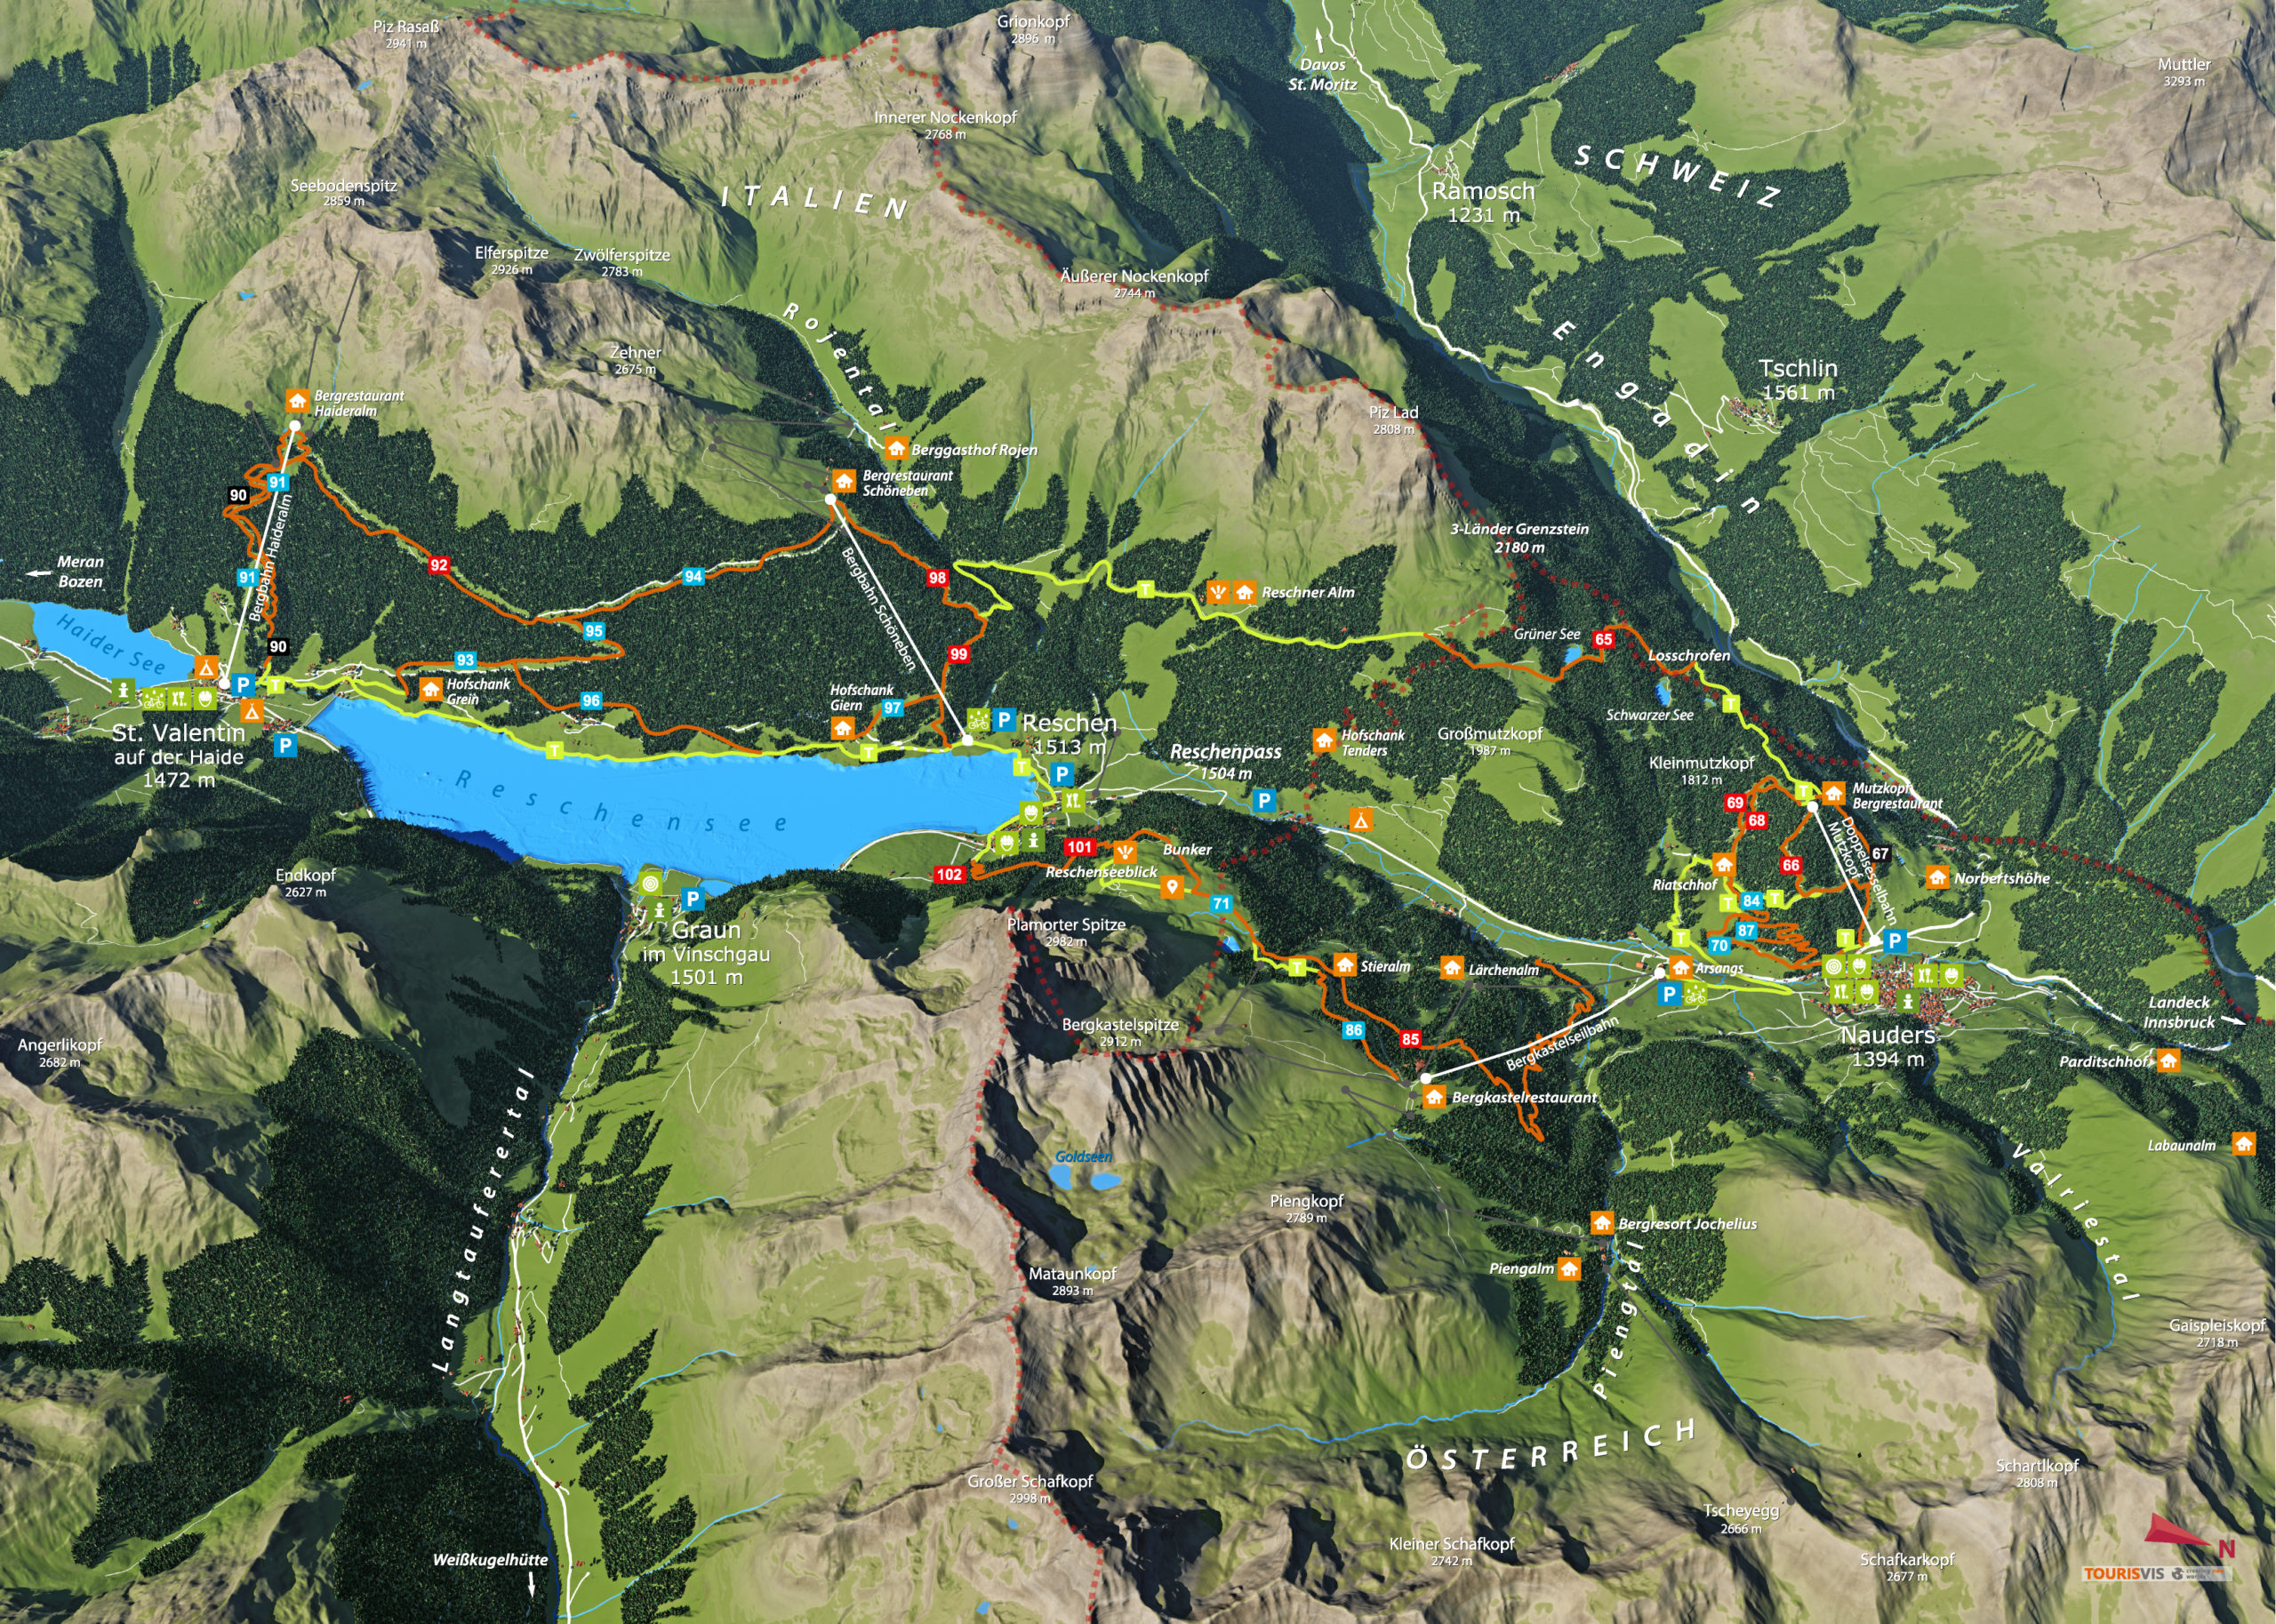 3D Panoramakarte Biken Endurotrail Ferienregion Reschenpass